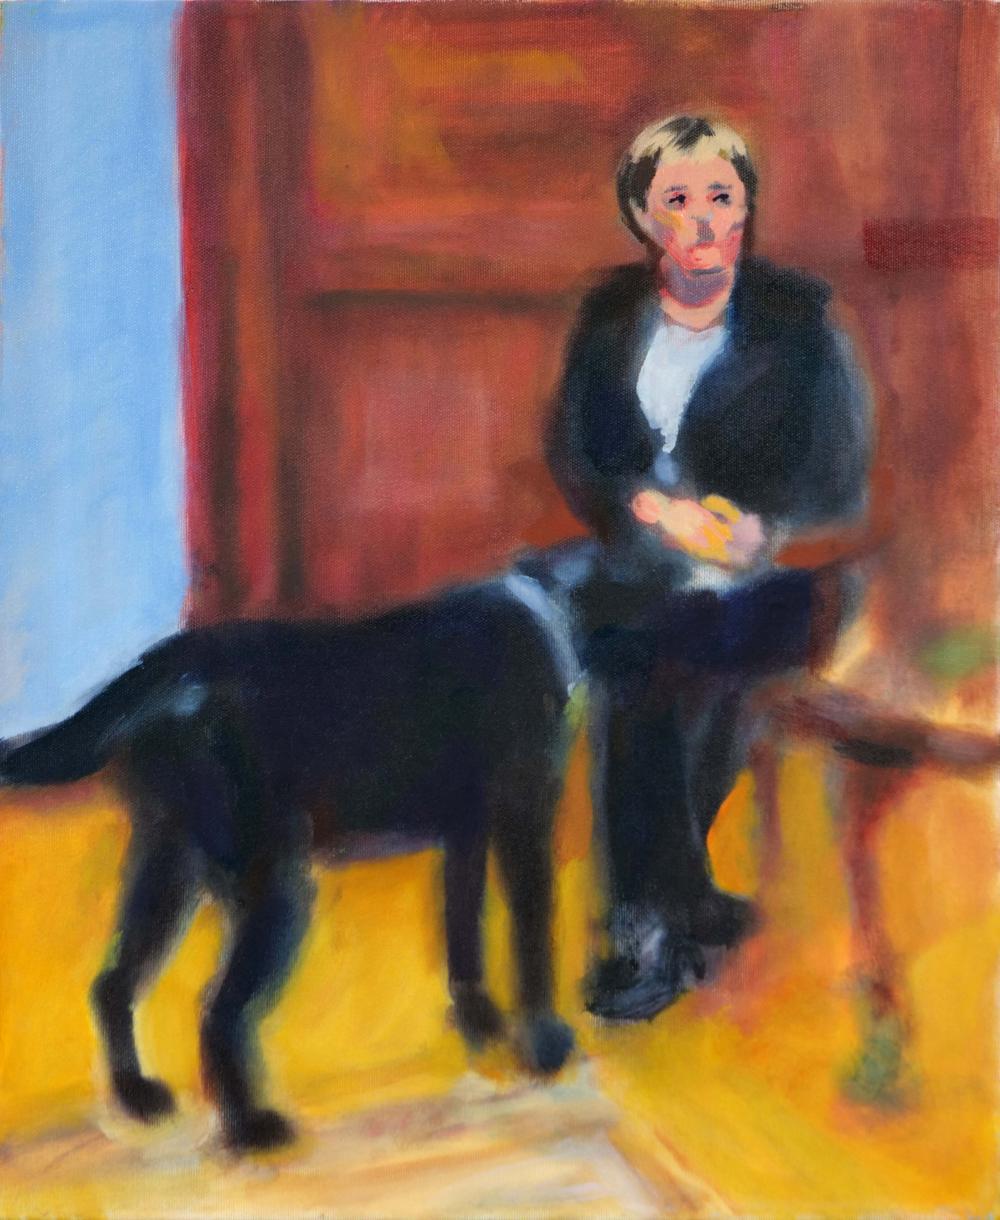 109Angela Merkel with Putins Bitch_ 2019_Oil on canvas_ 55x45 cm